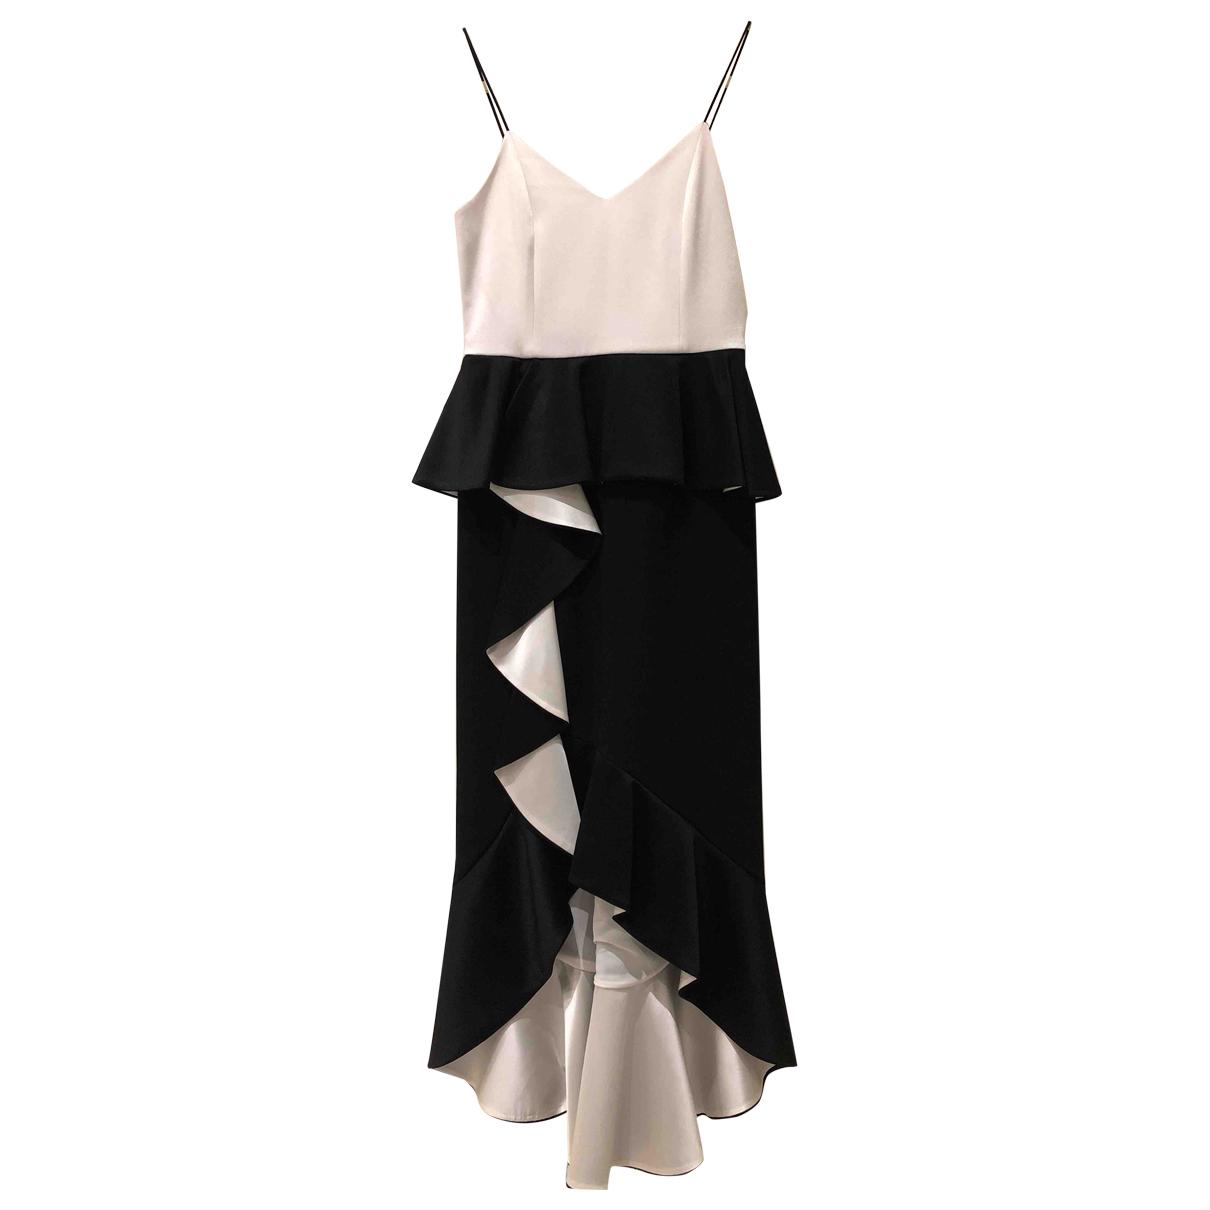 Alice & Olivia \N Kleid in  Bunt Polyester